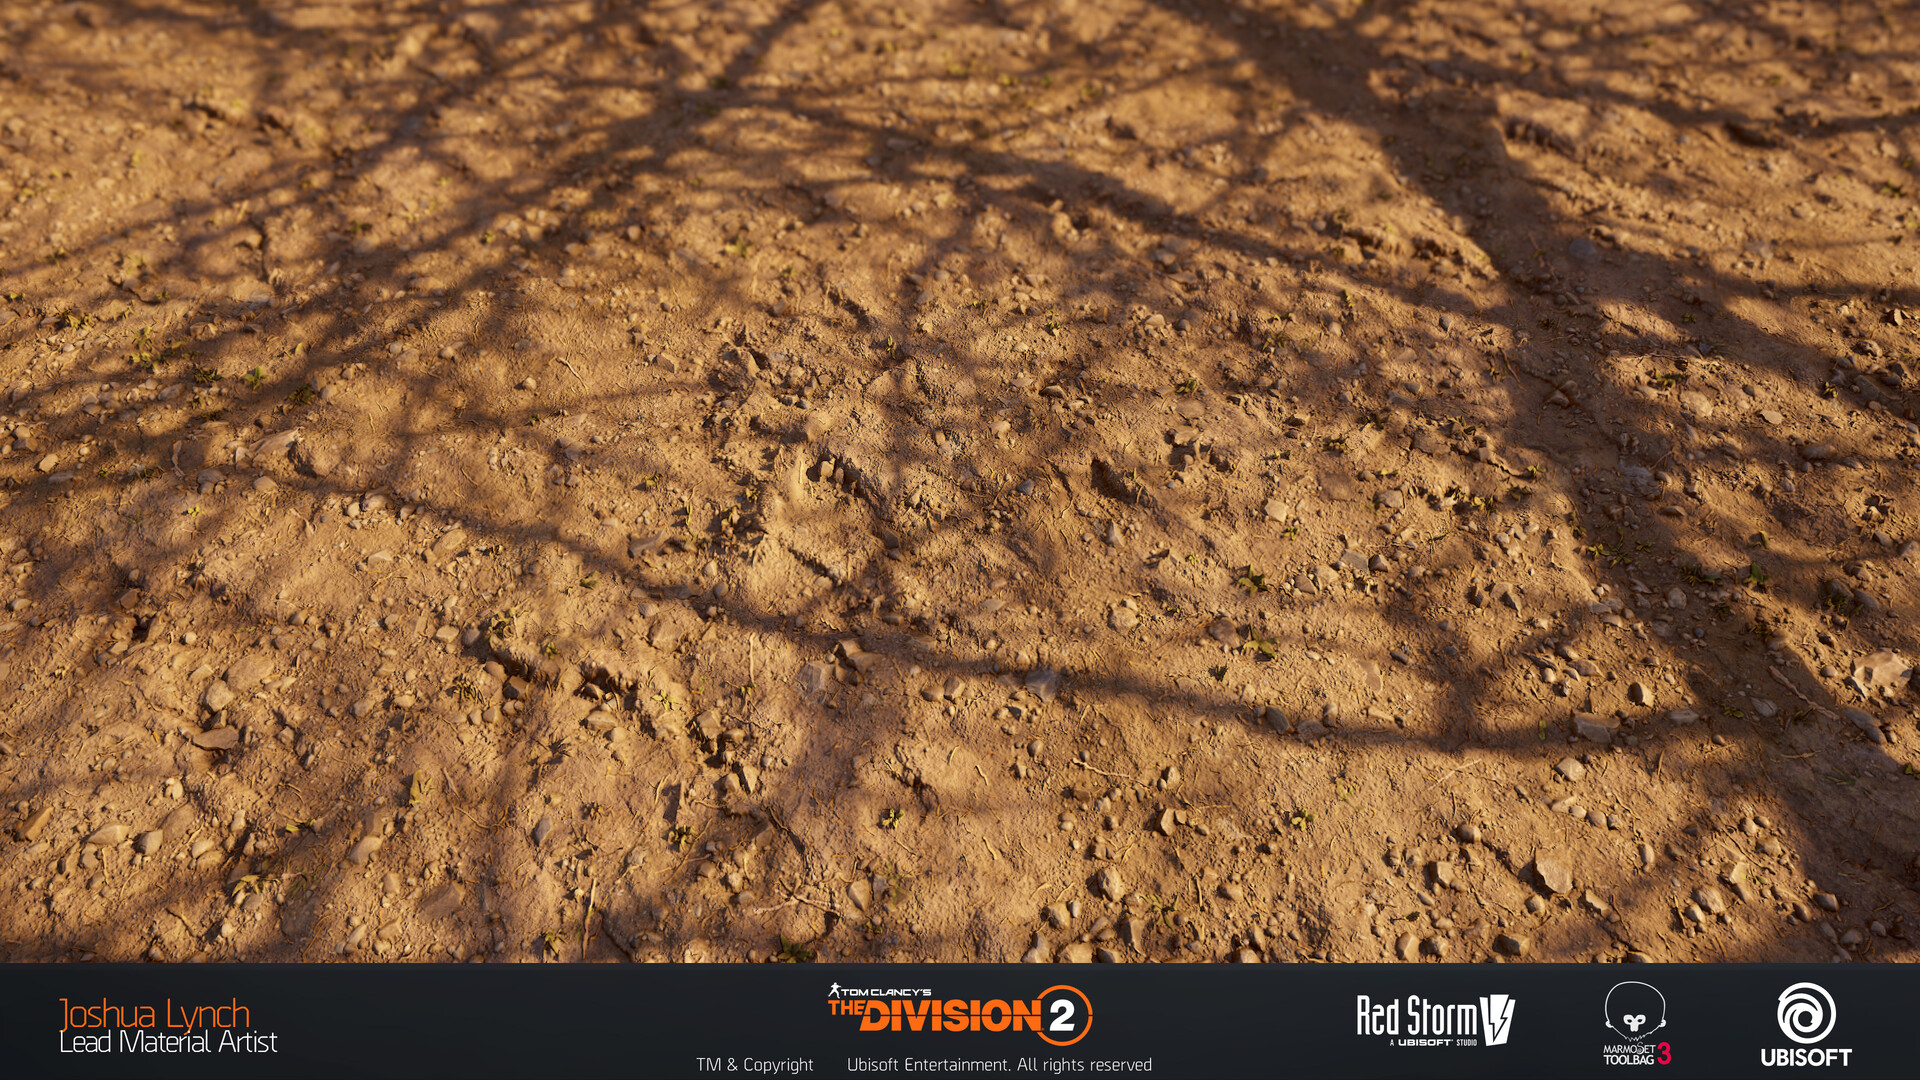 Joshua lynch division 2 josh lynch soil dirt ground